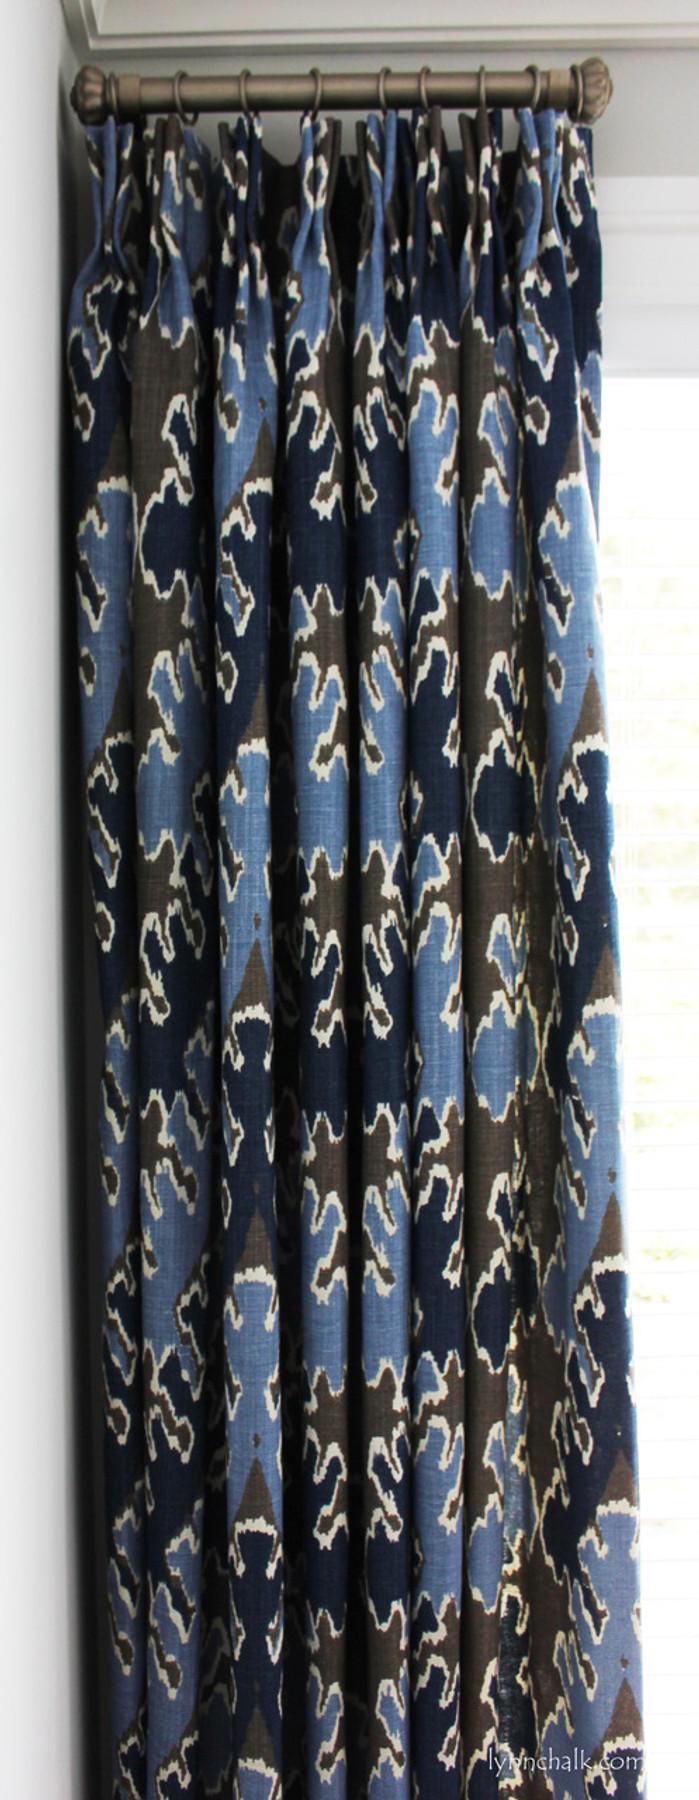 Custom Drapes by Lynn Chalk in Kelly Wearstler Bengal Bazaar Grey Indigo